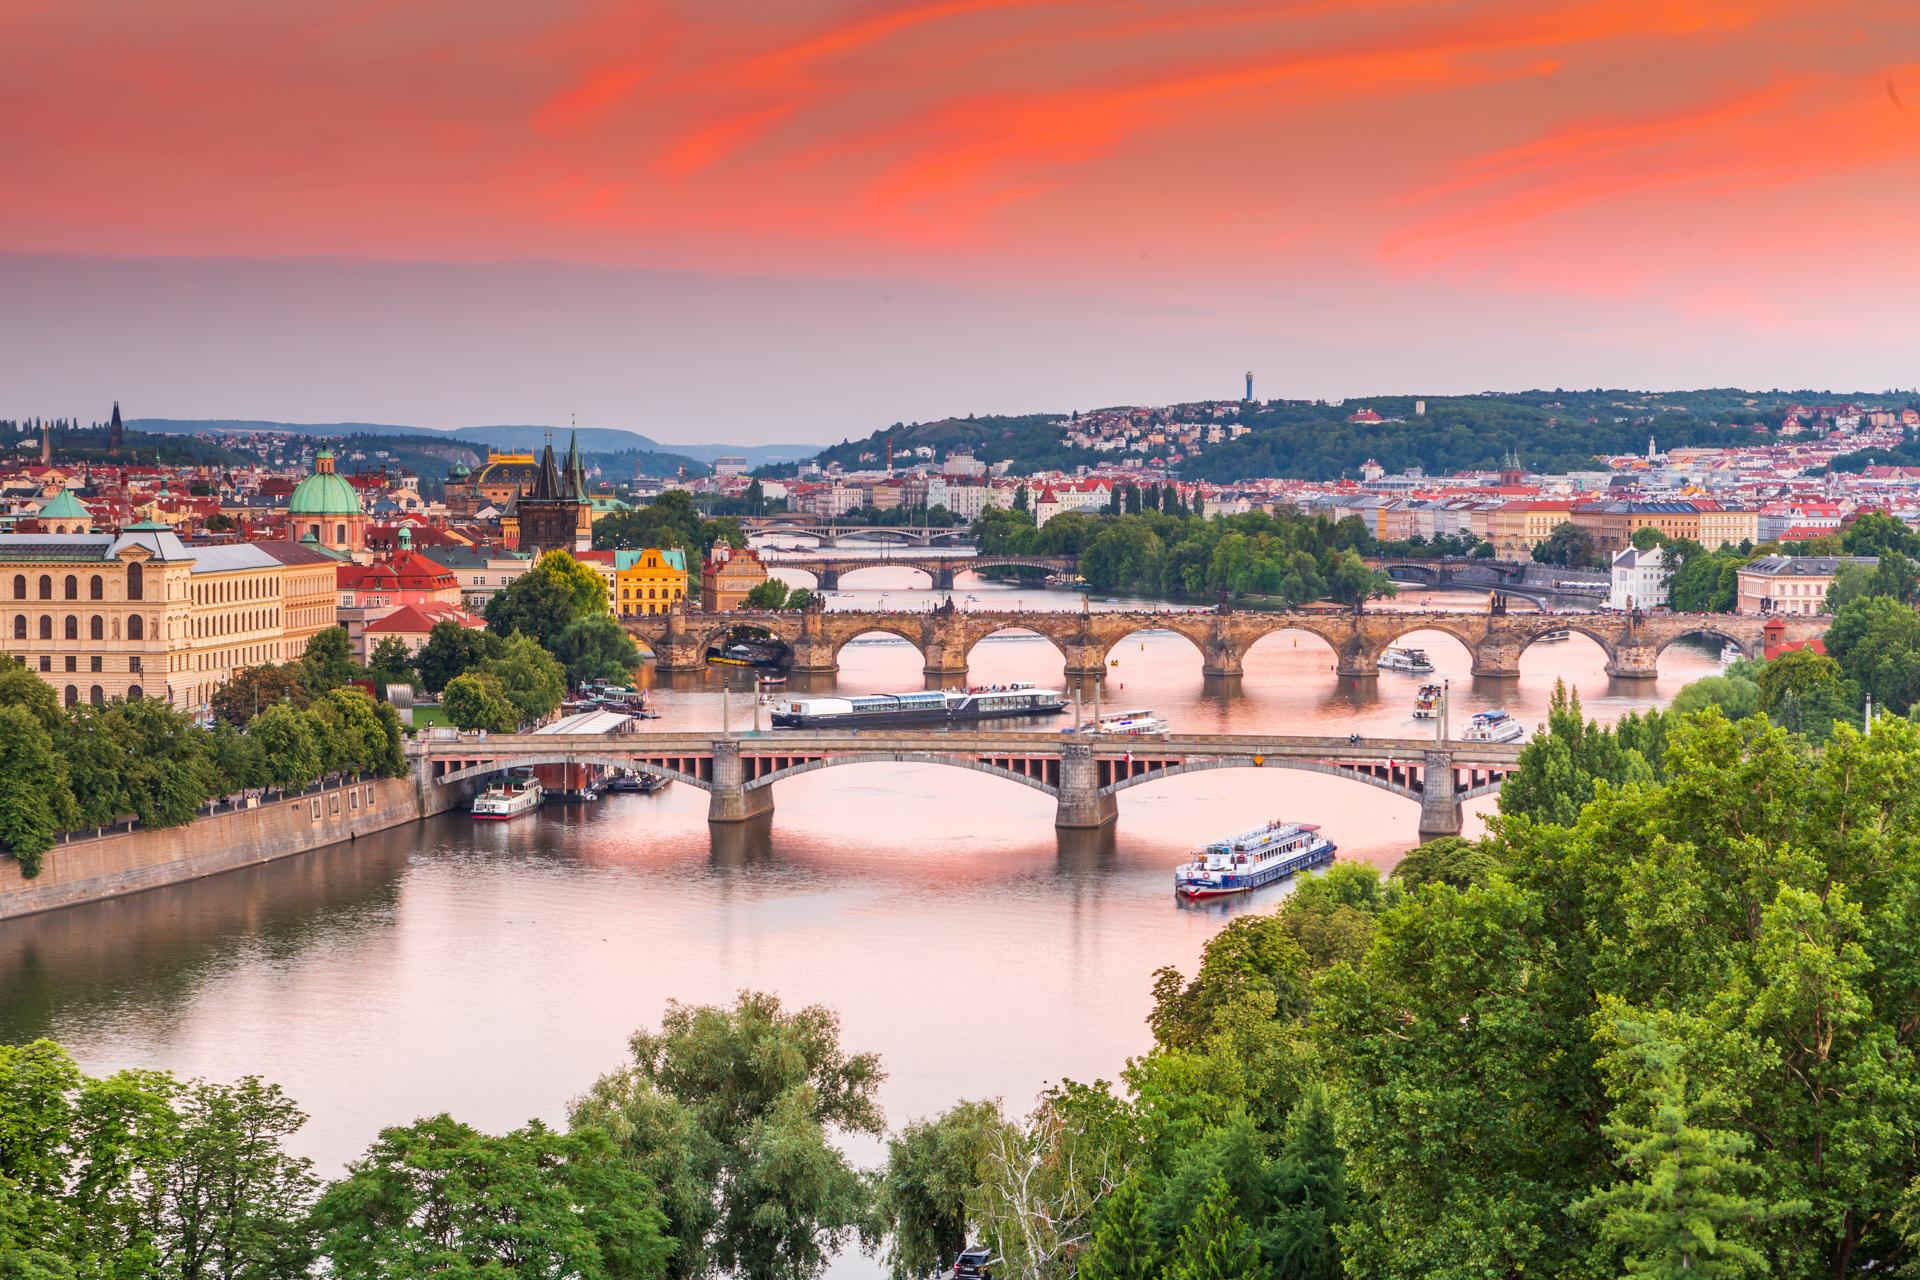 Prague in sunset, July 6, 2018